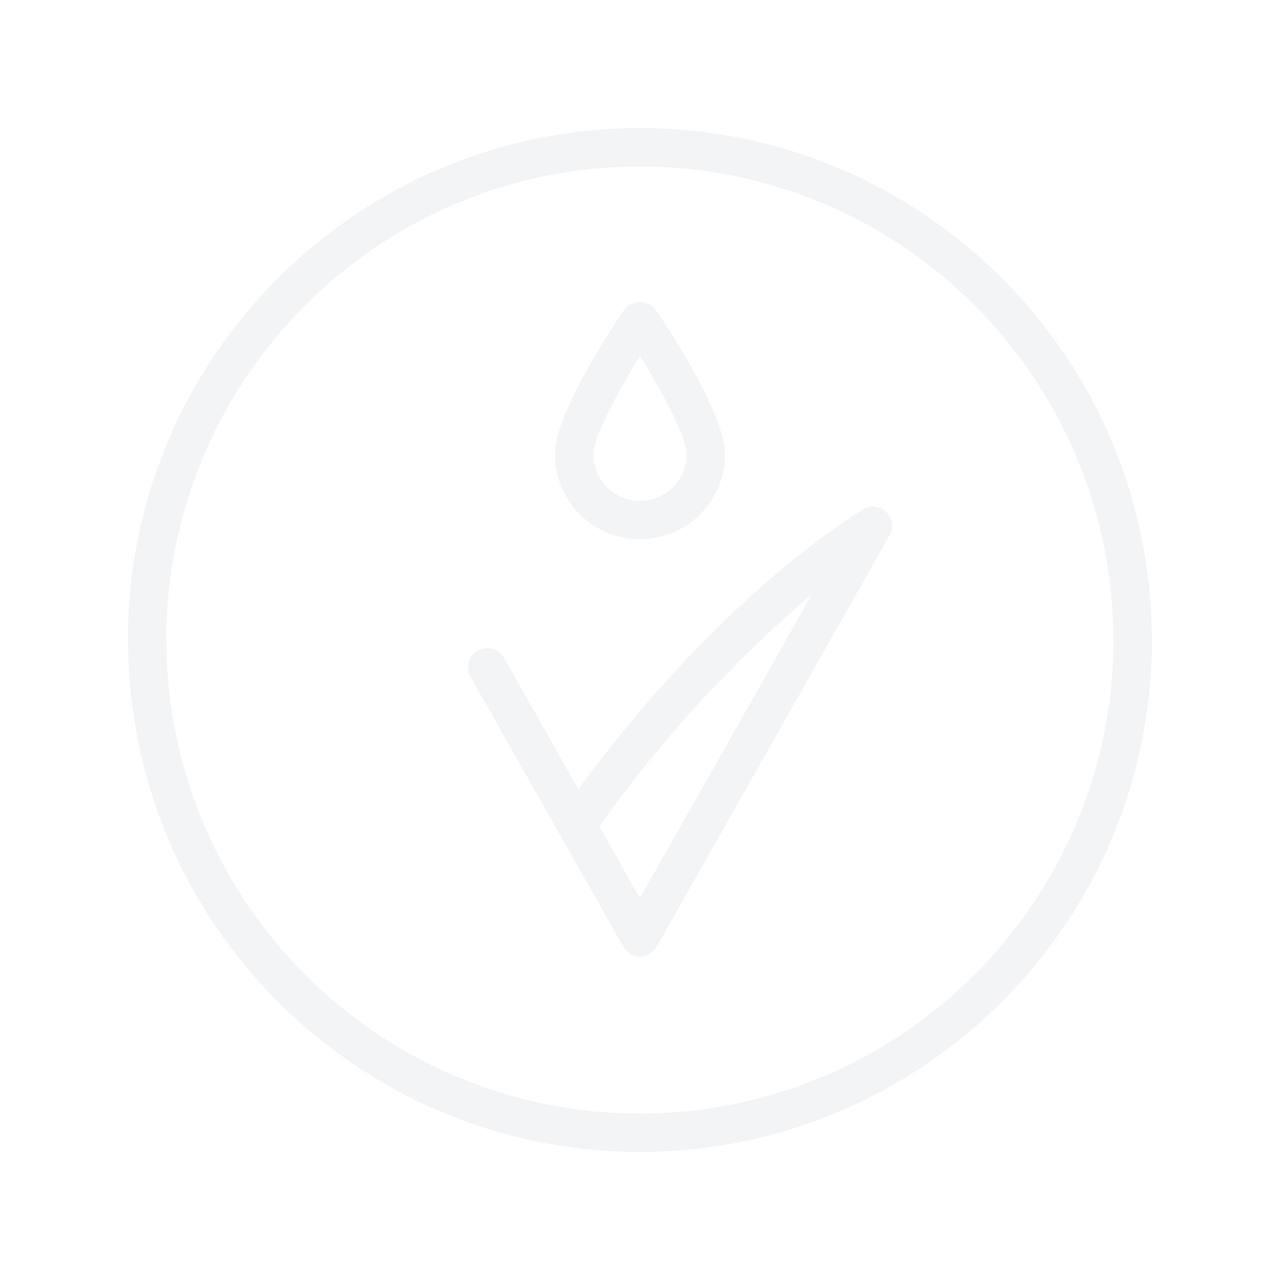 KARL LAGERFELD Bois De Vetiver Deodorant Stick 75g дезодорант для тела